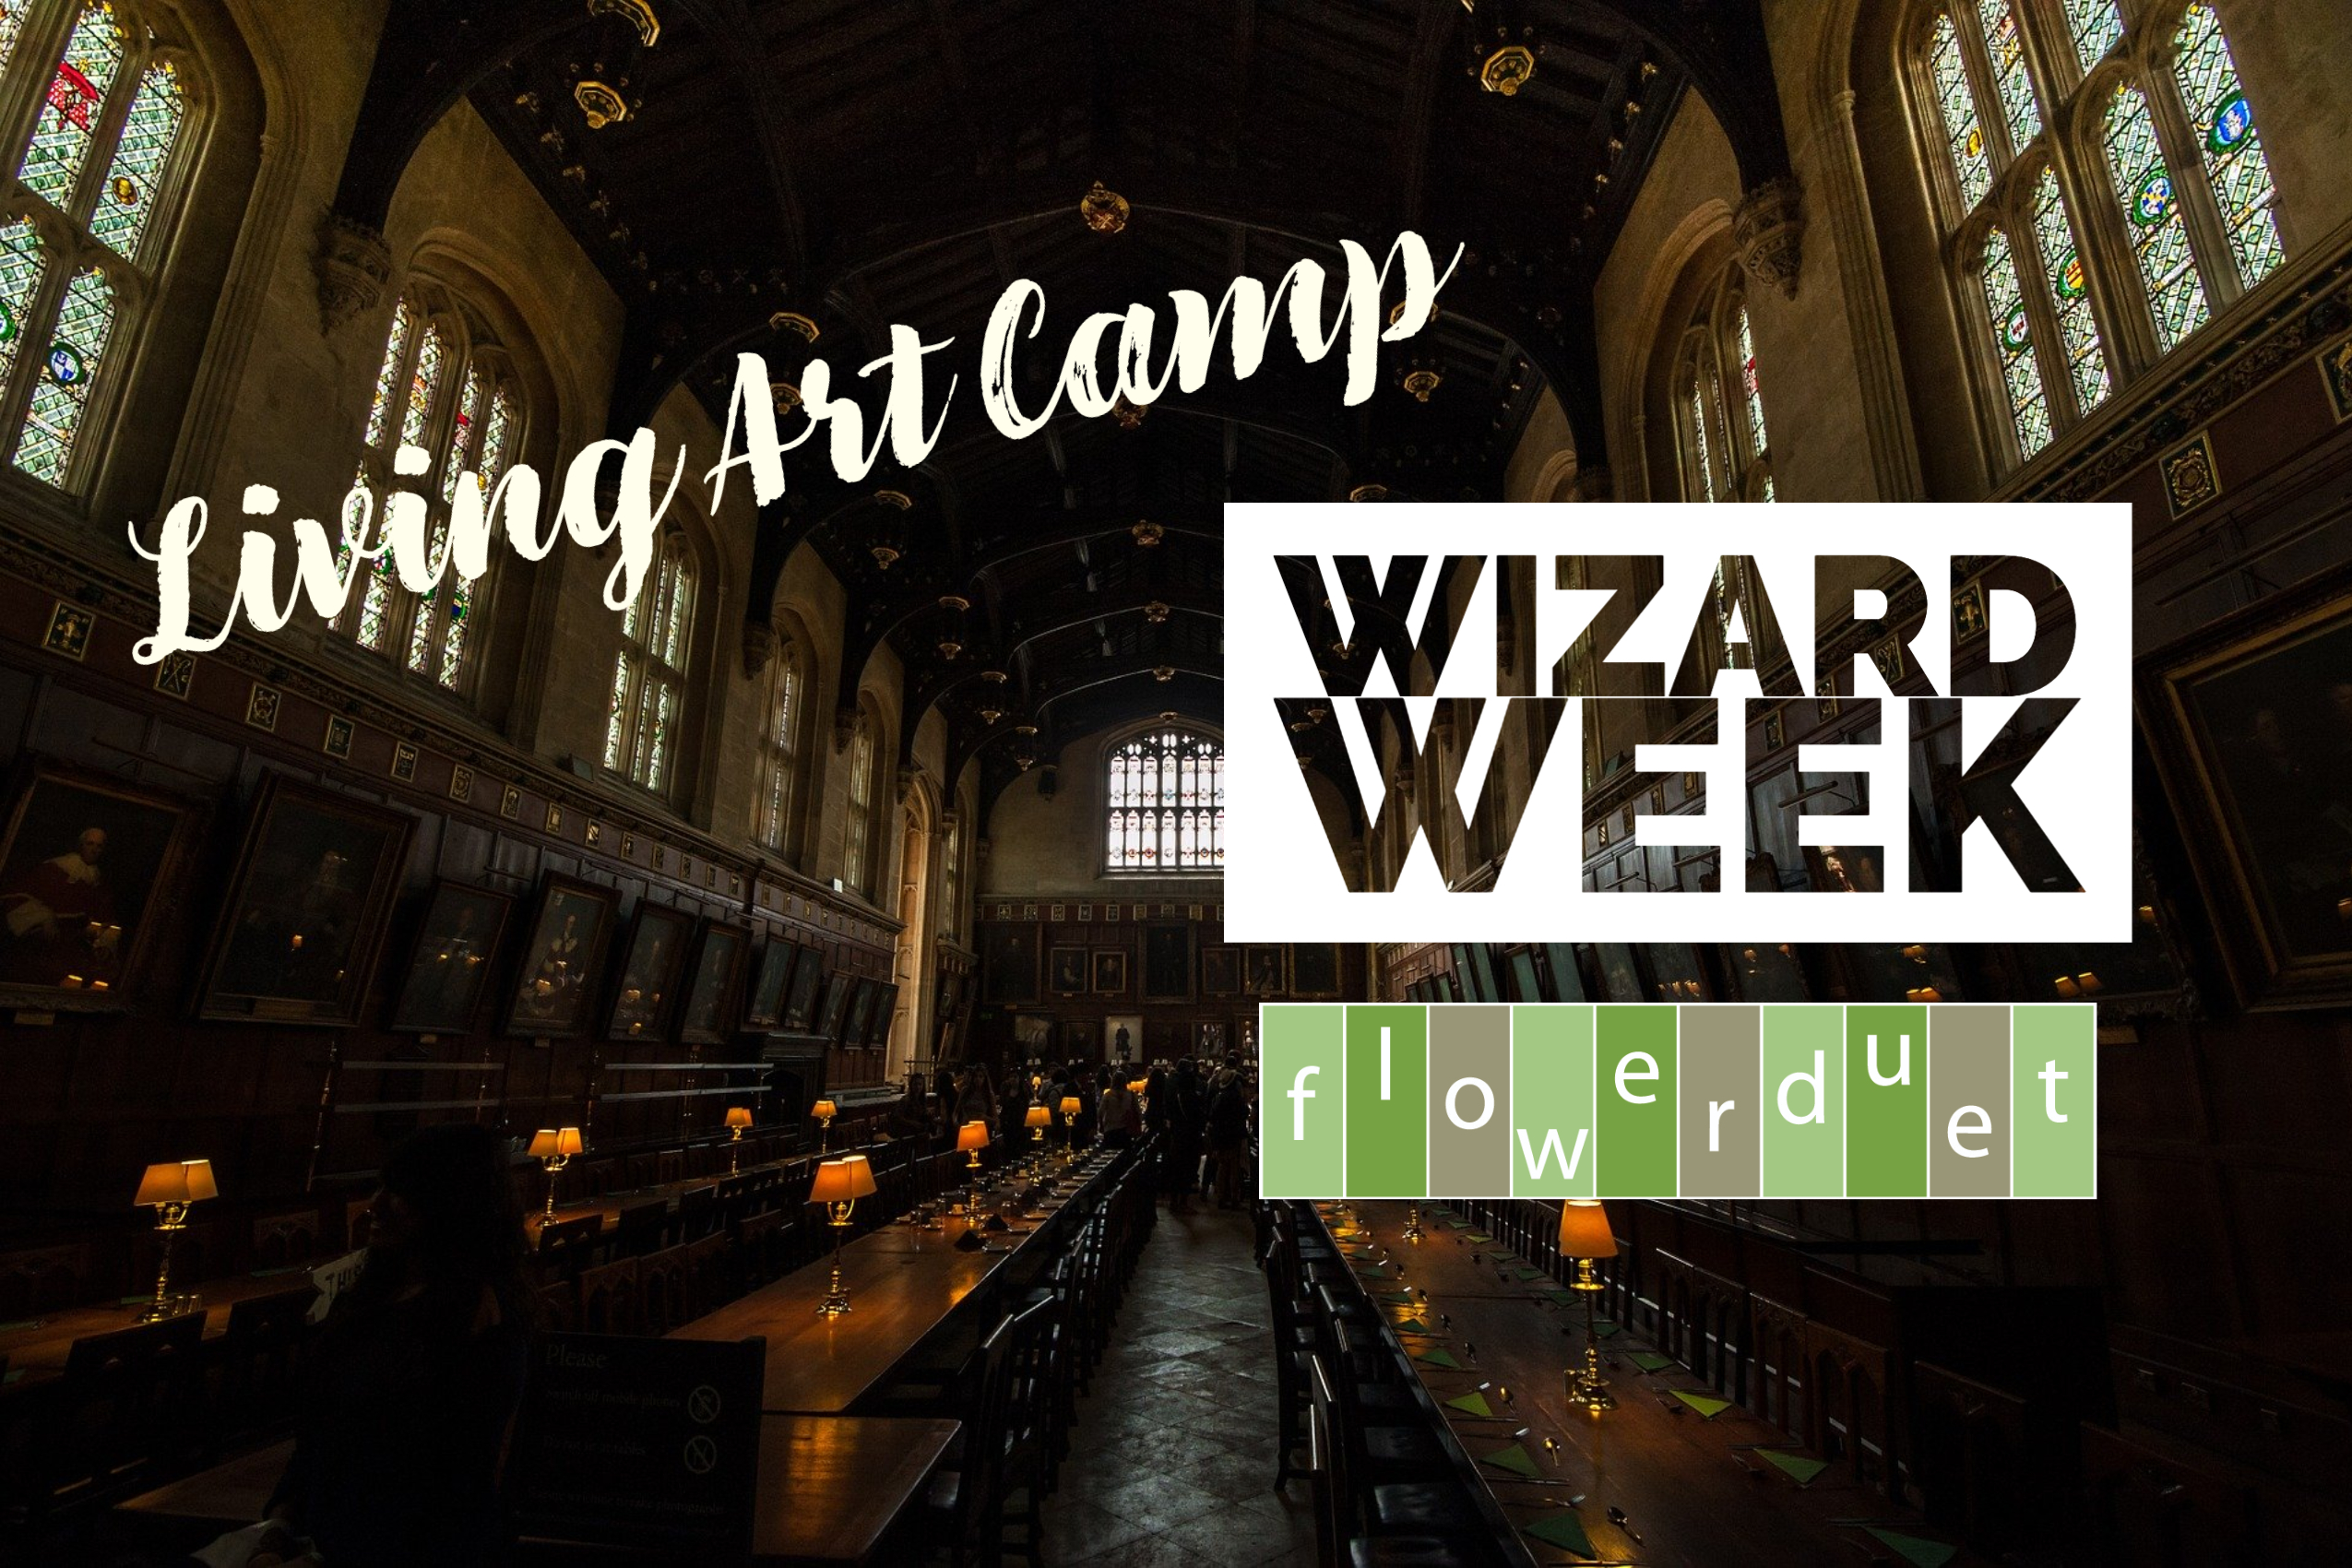 Wizard Week